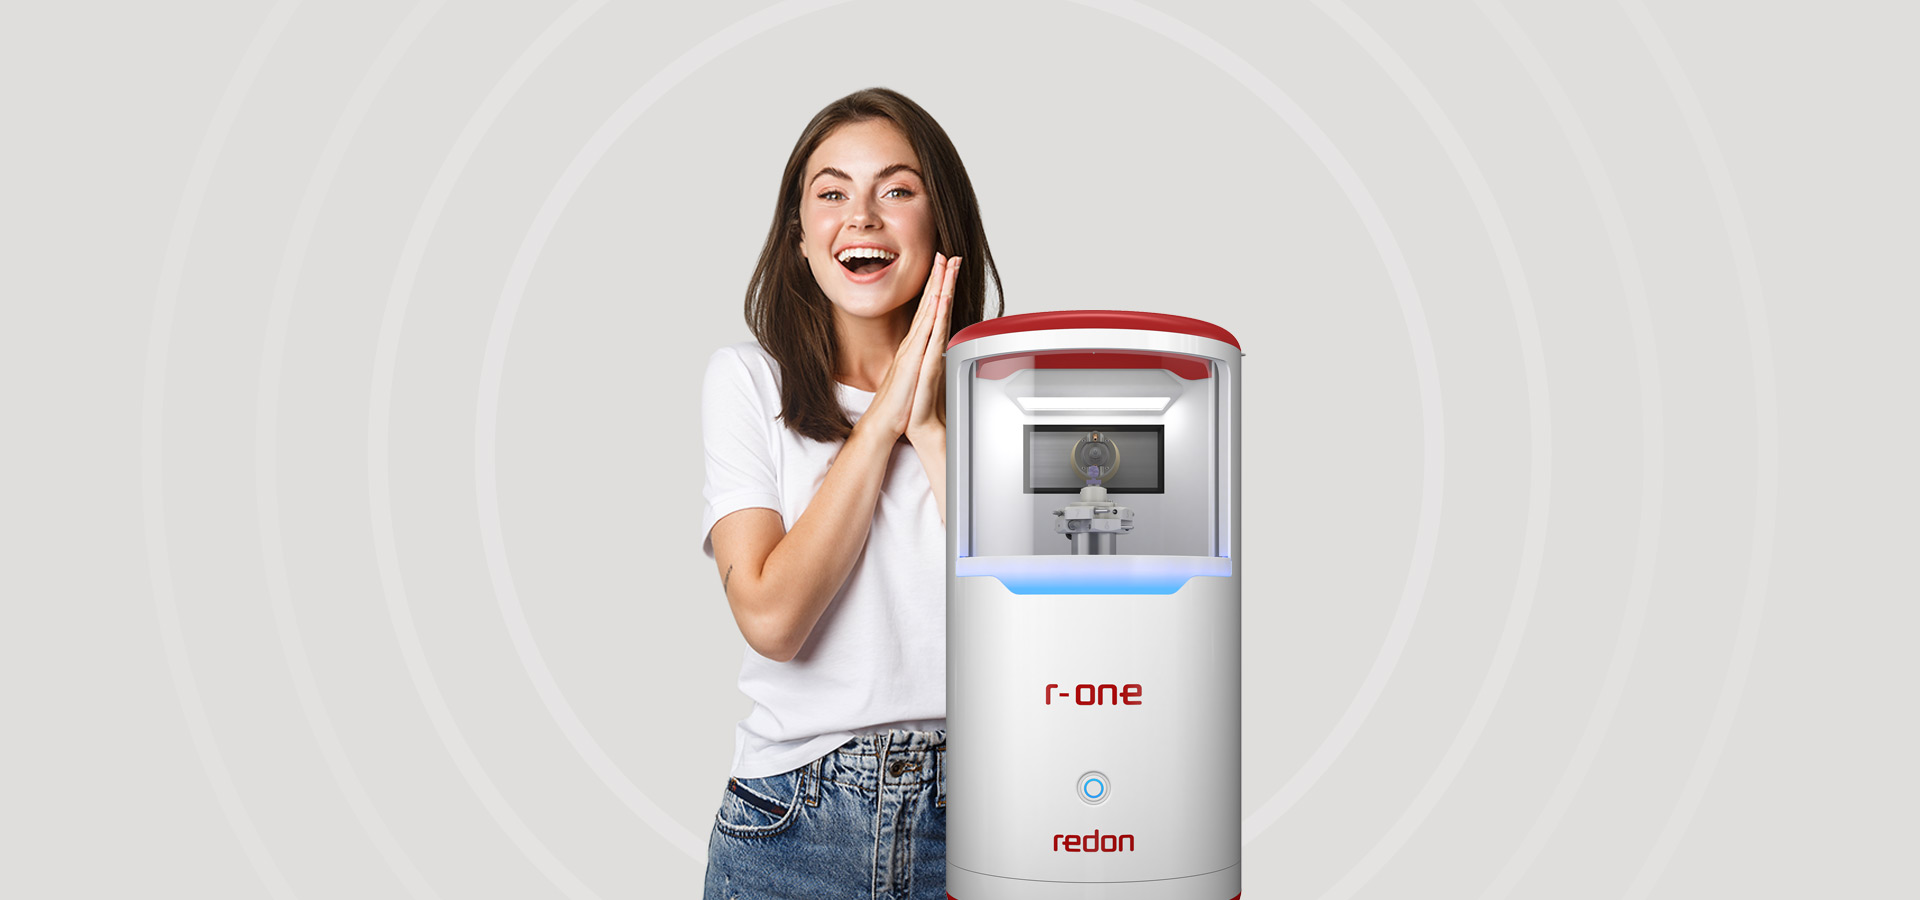 Redon R-One